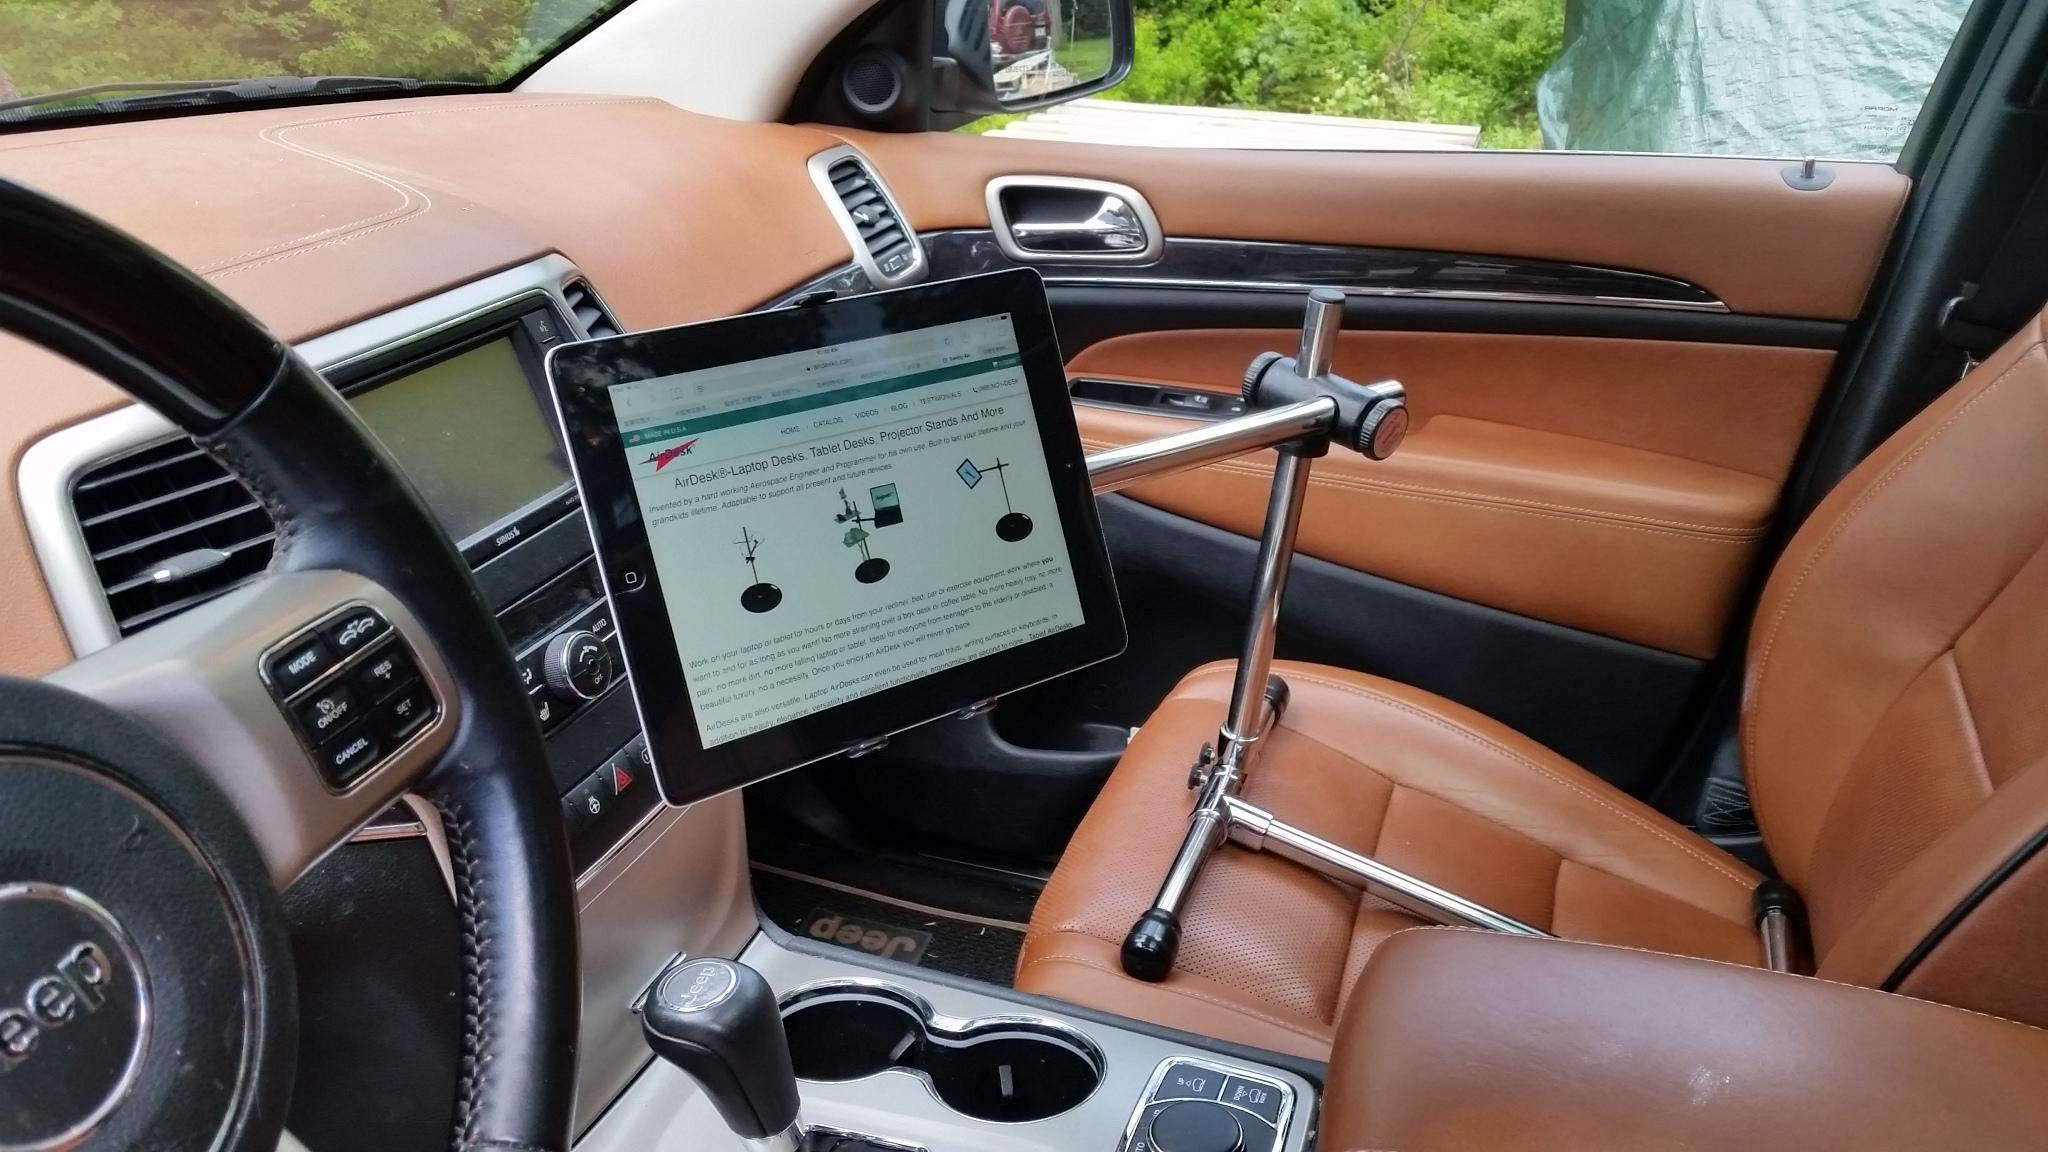 Mobile Airdesk Driver View Cartablet